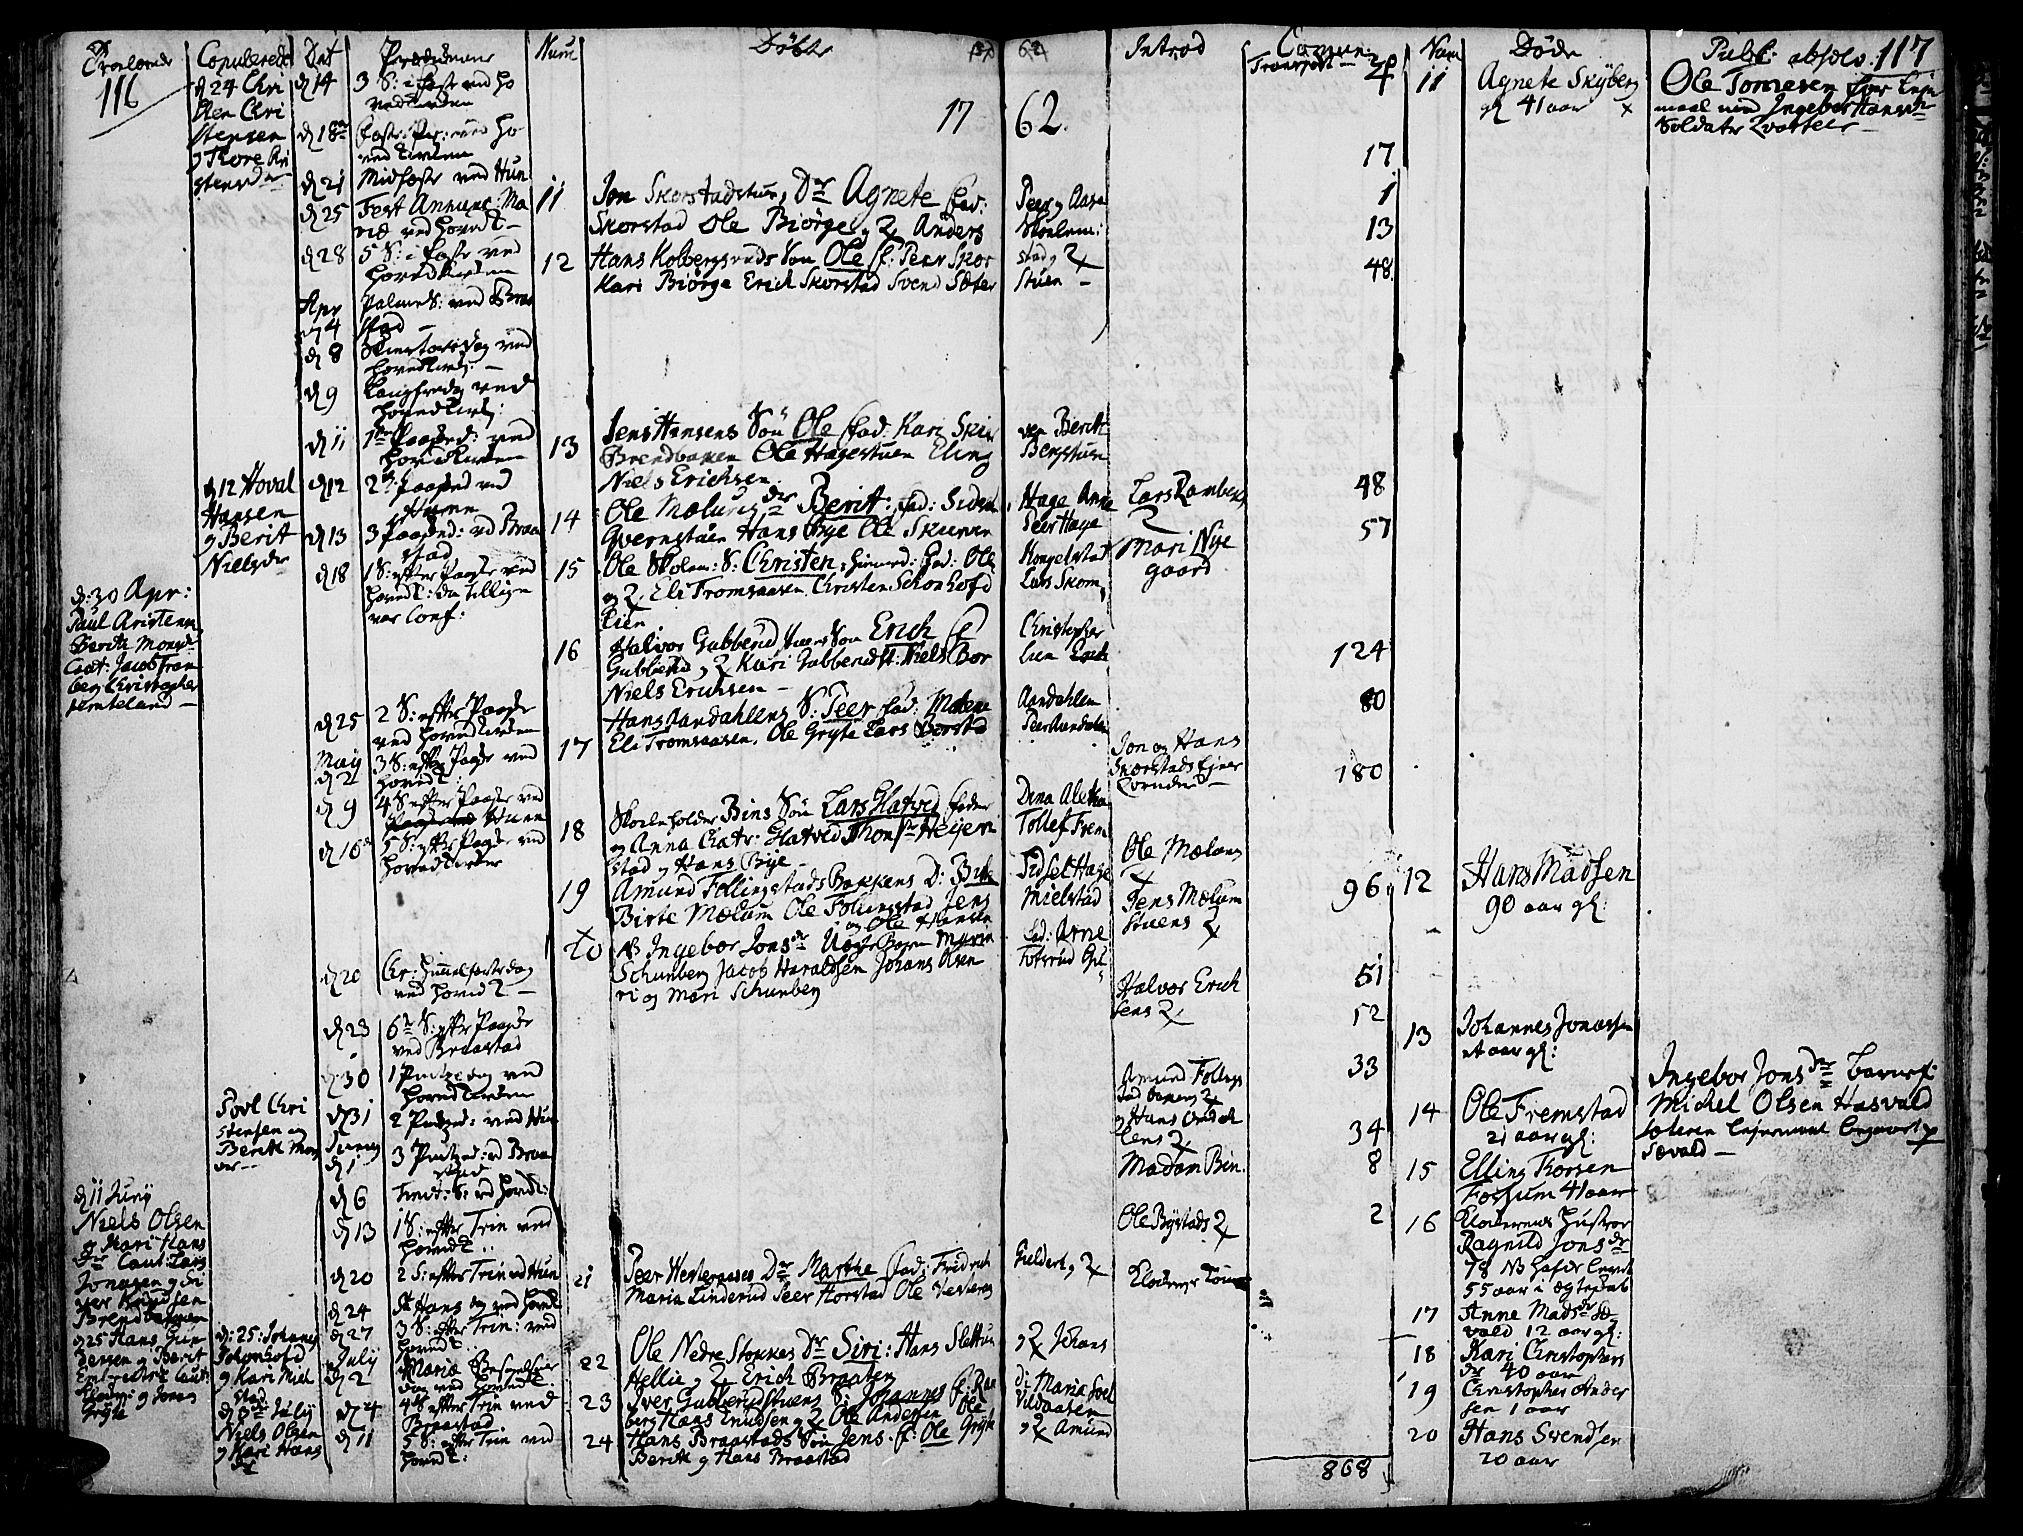 SAH, Vardal prestekontor, H/Ha/Haa/L0002: Ministerialbok nr. 2, 1748-1776, s. 116-117